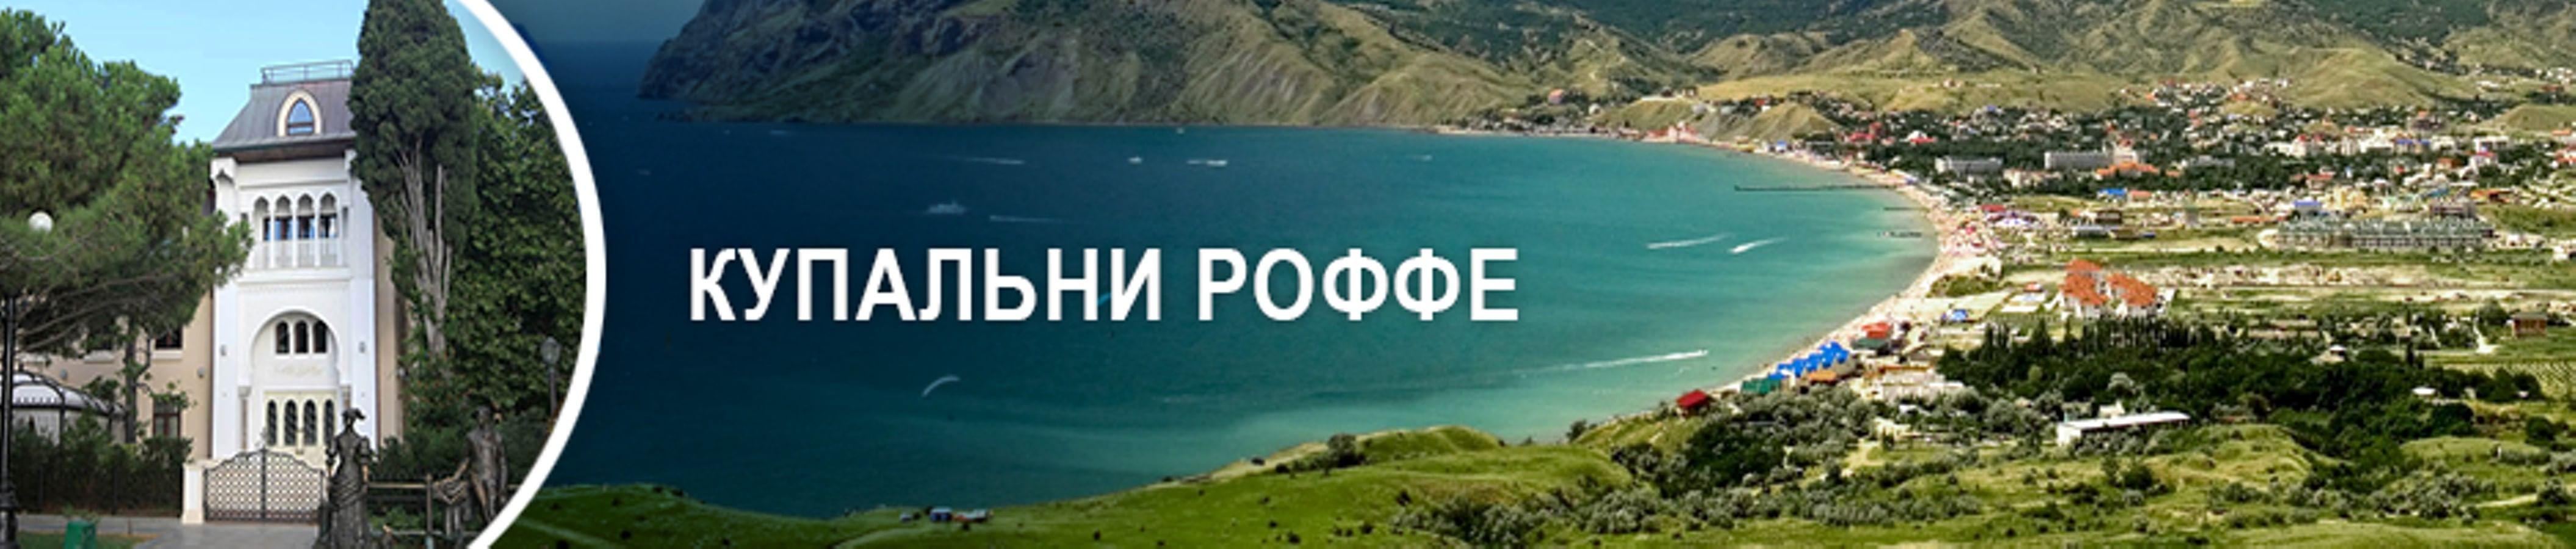 Купальни Роффе